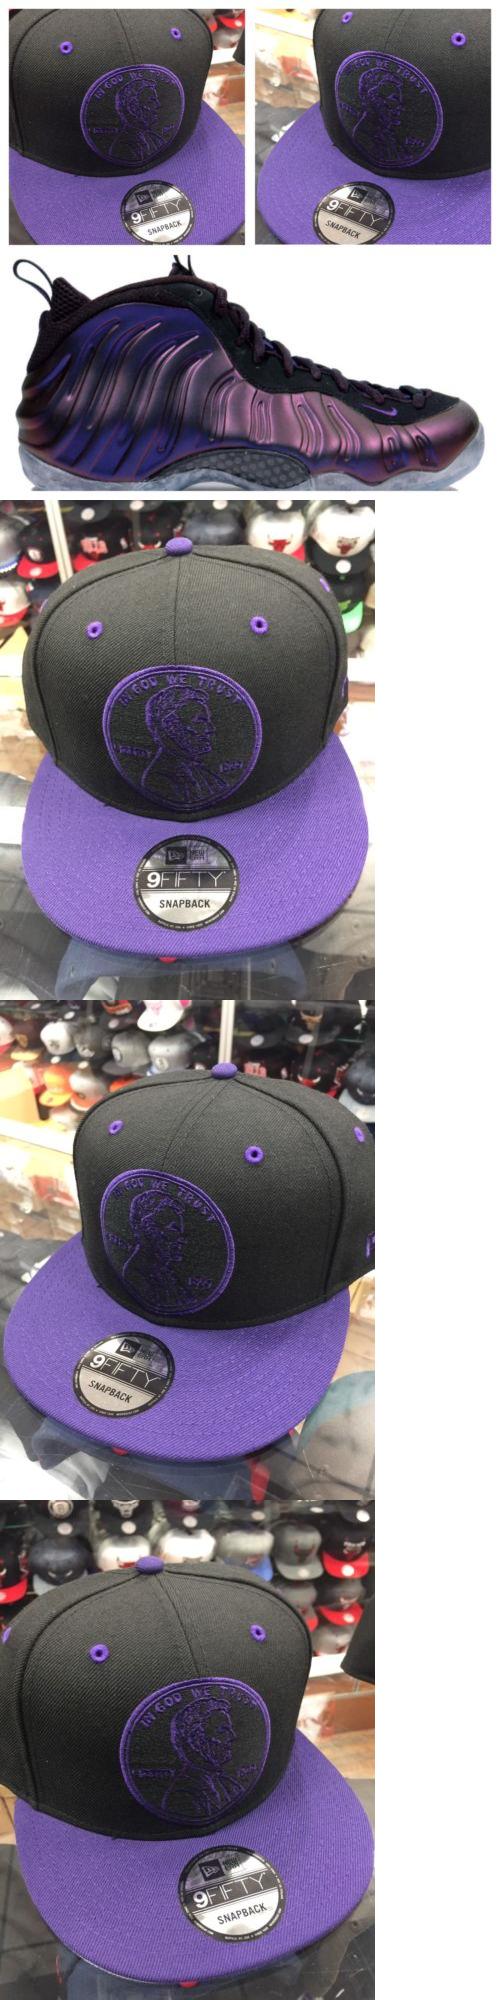 on sale c89ea df692 Hats 52365  Penny Snapback To Match Eggplant Foamposite -  BUY IT NOW ONLY    33.99 on eBay!